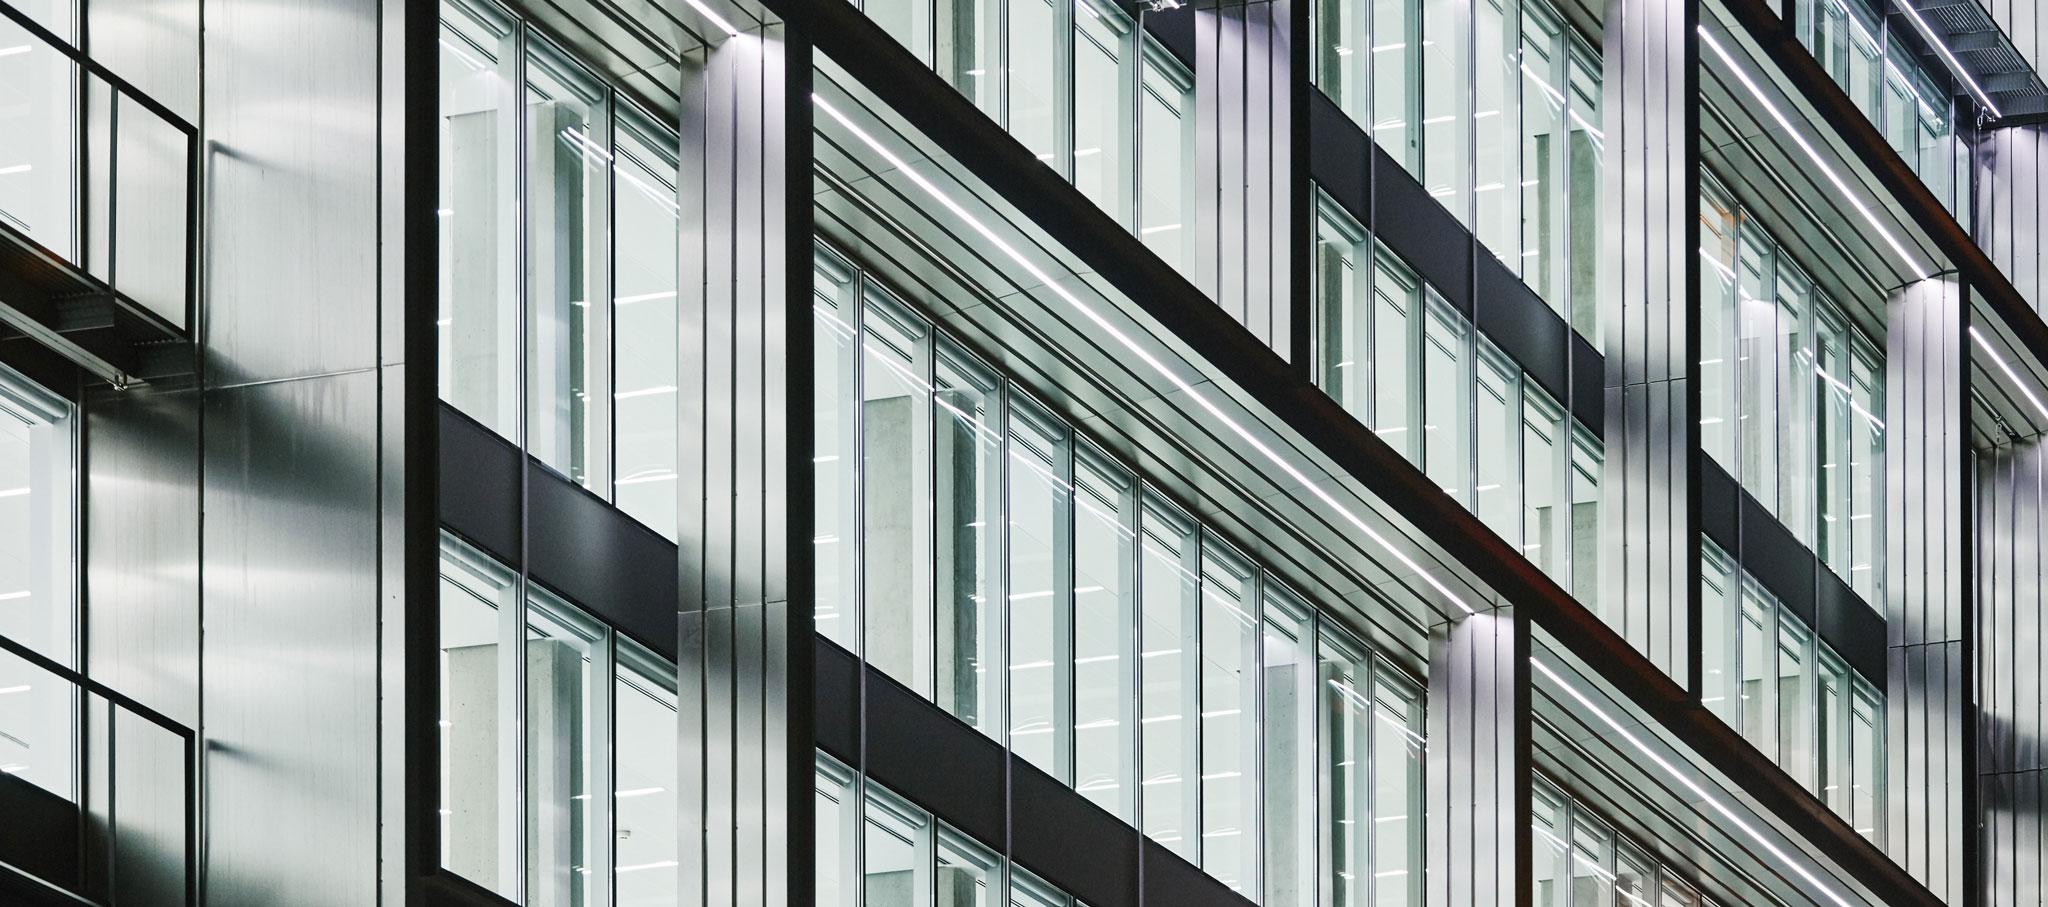 Detail façade. 'Discovery Building' by Estudio Lamela. Photography by Daniel Schäfer